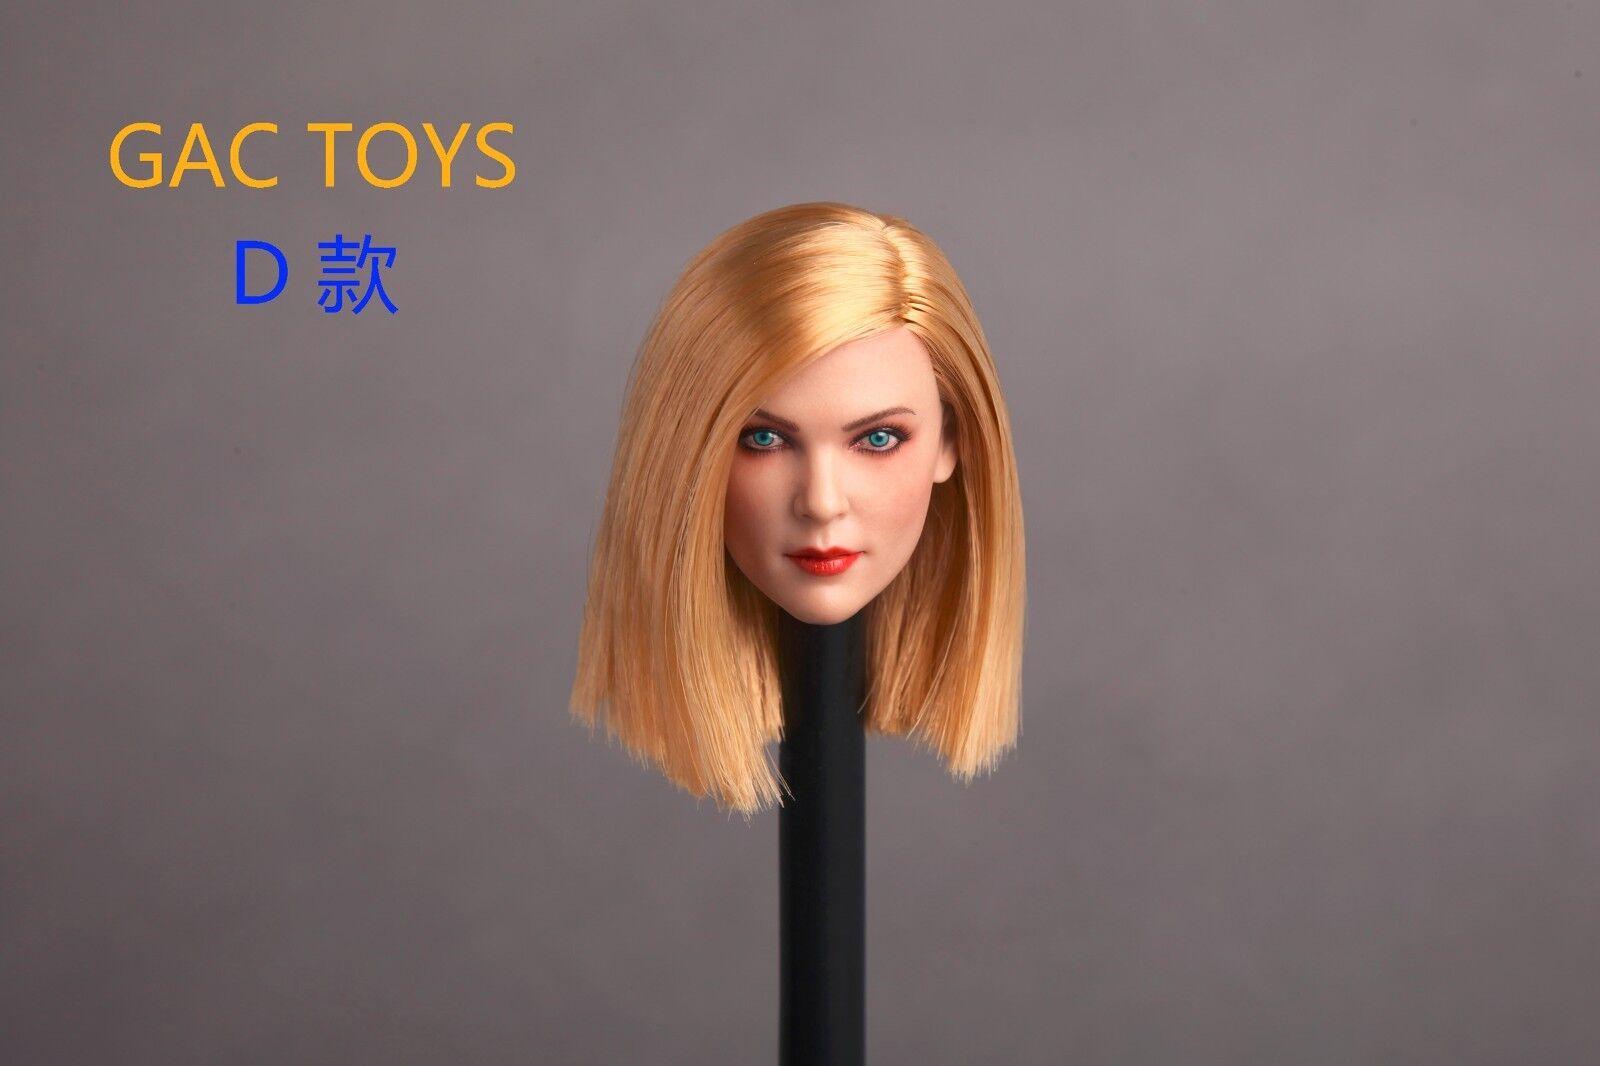 GACTOYS 1 6 Scale Blond Long Hair GC006 Head Sculpt F 12'' Female Body Figure